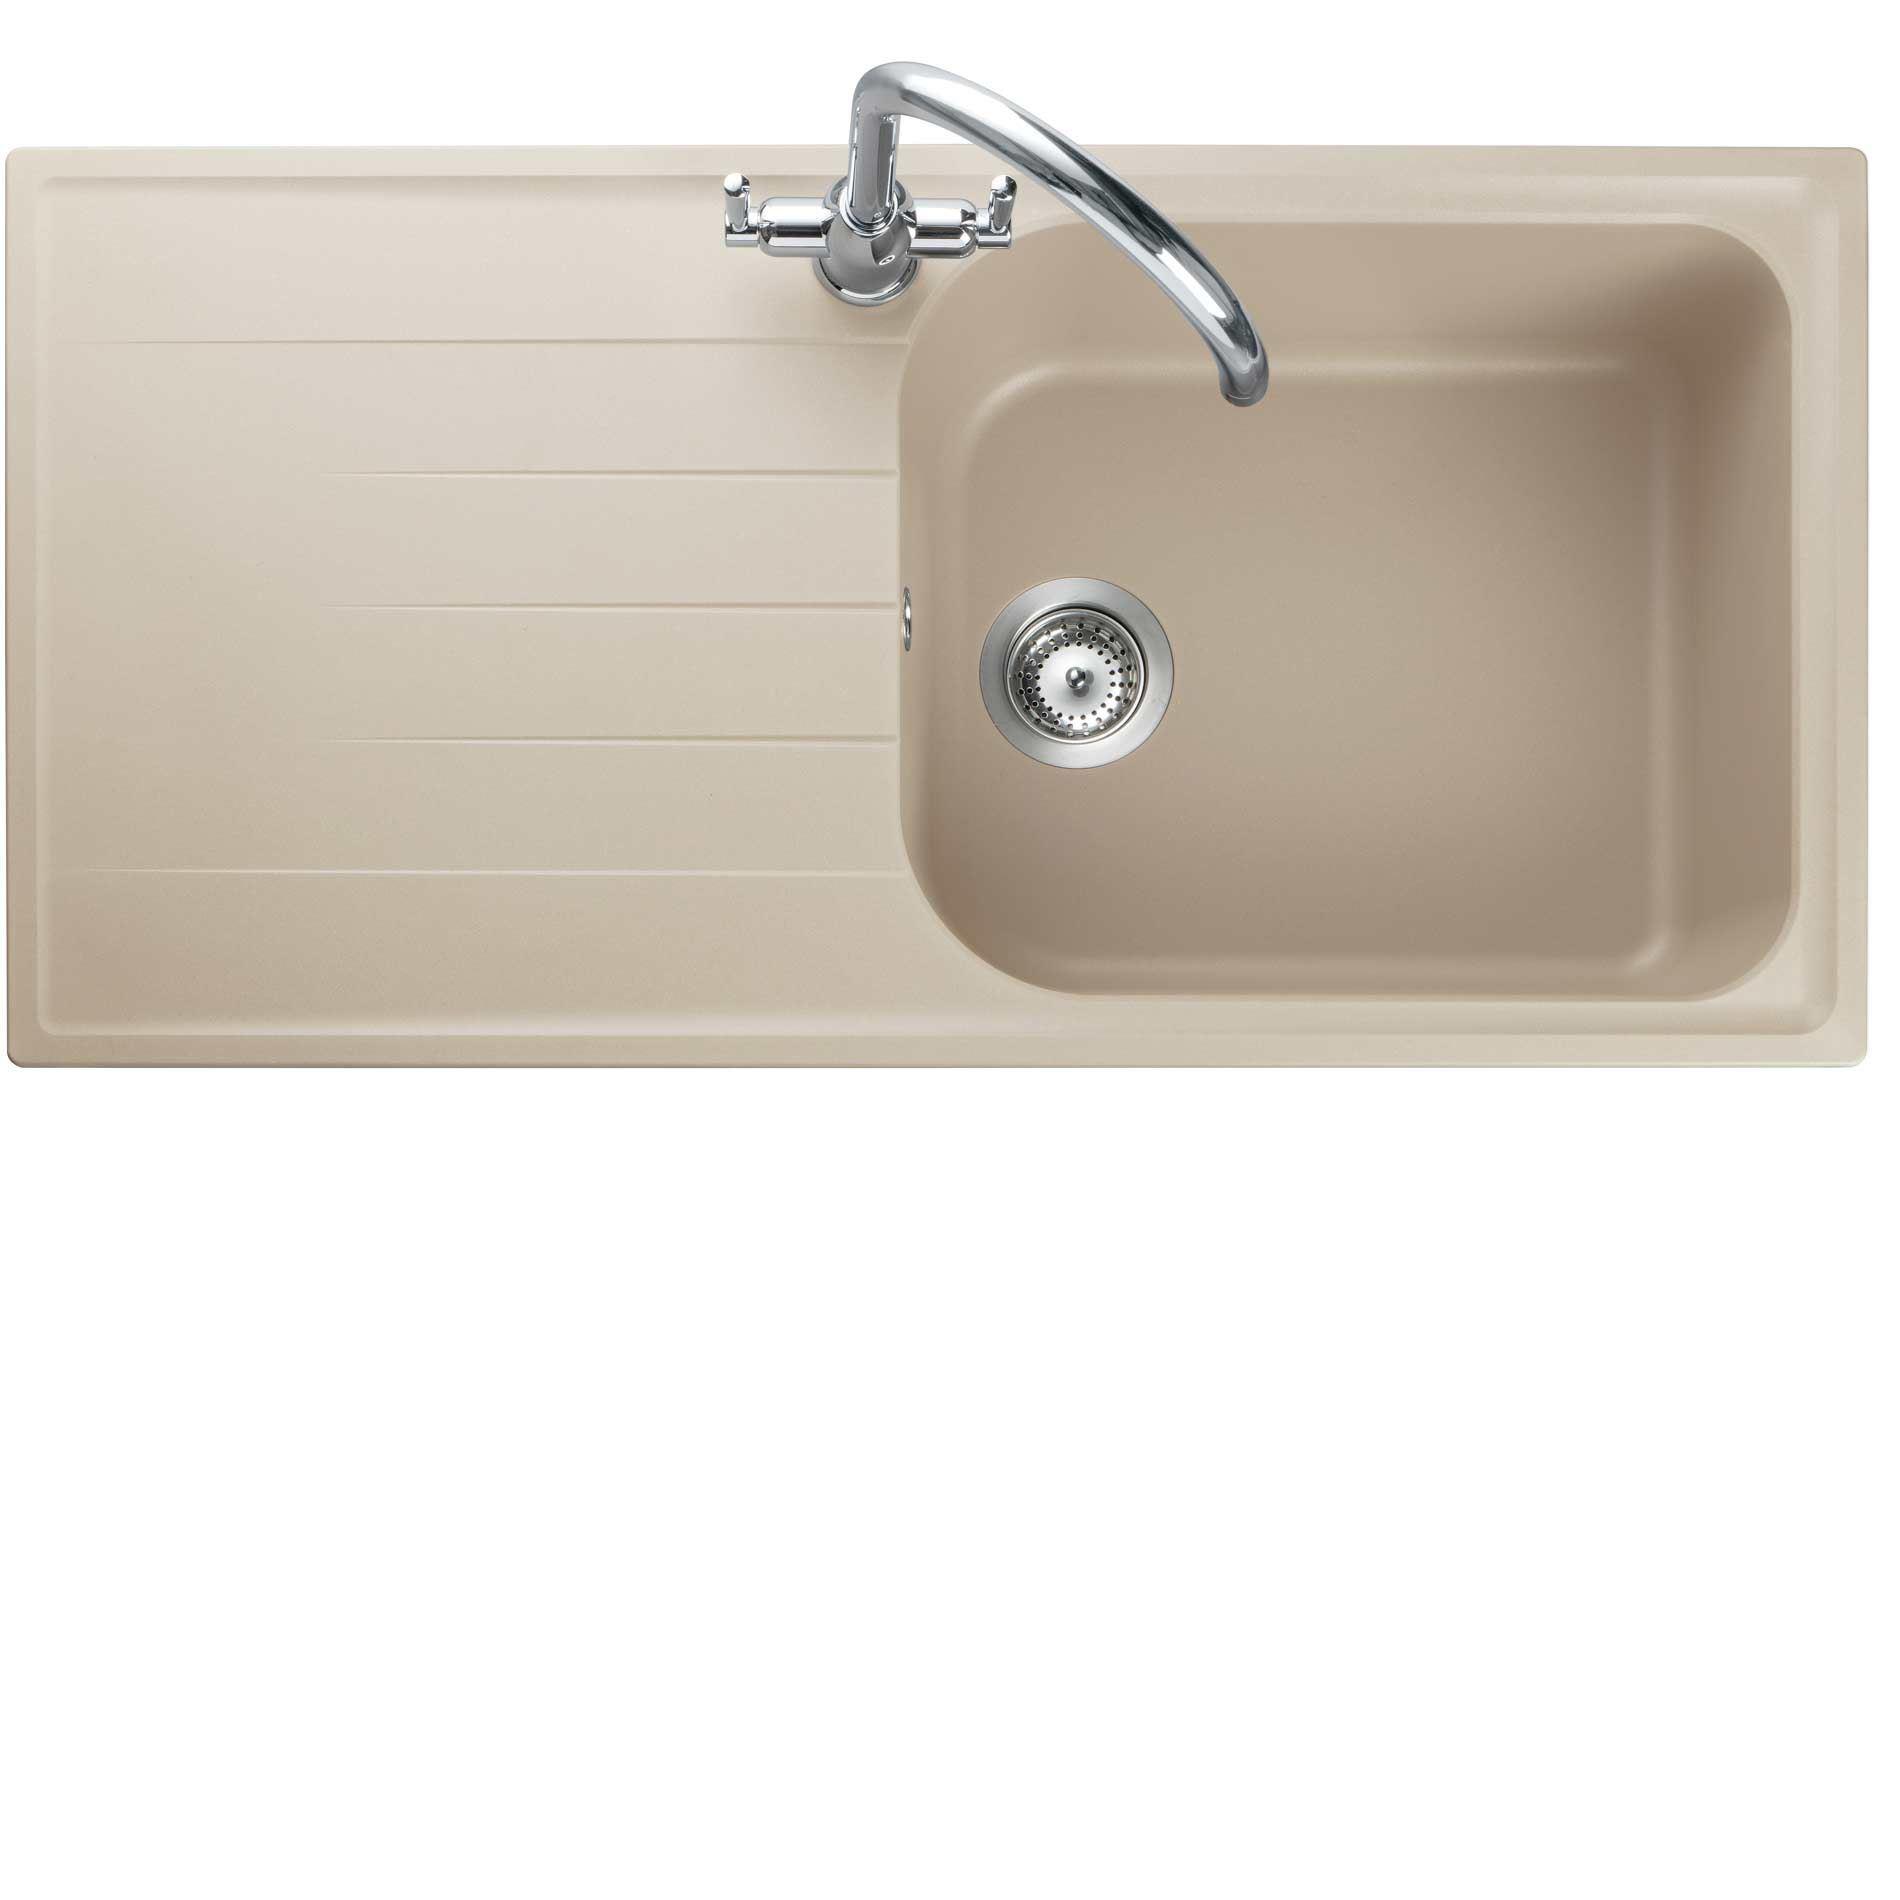 Amethyst Stone Sink : ... : Amethyst AME1051 Stone Igneous Sink - Kitchen Sinks & Taps